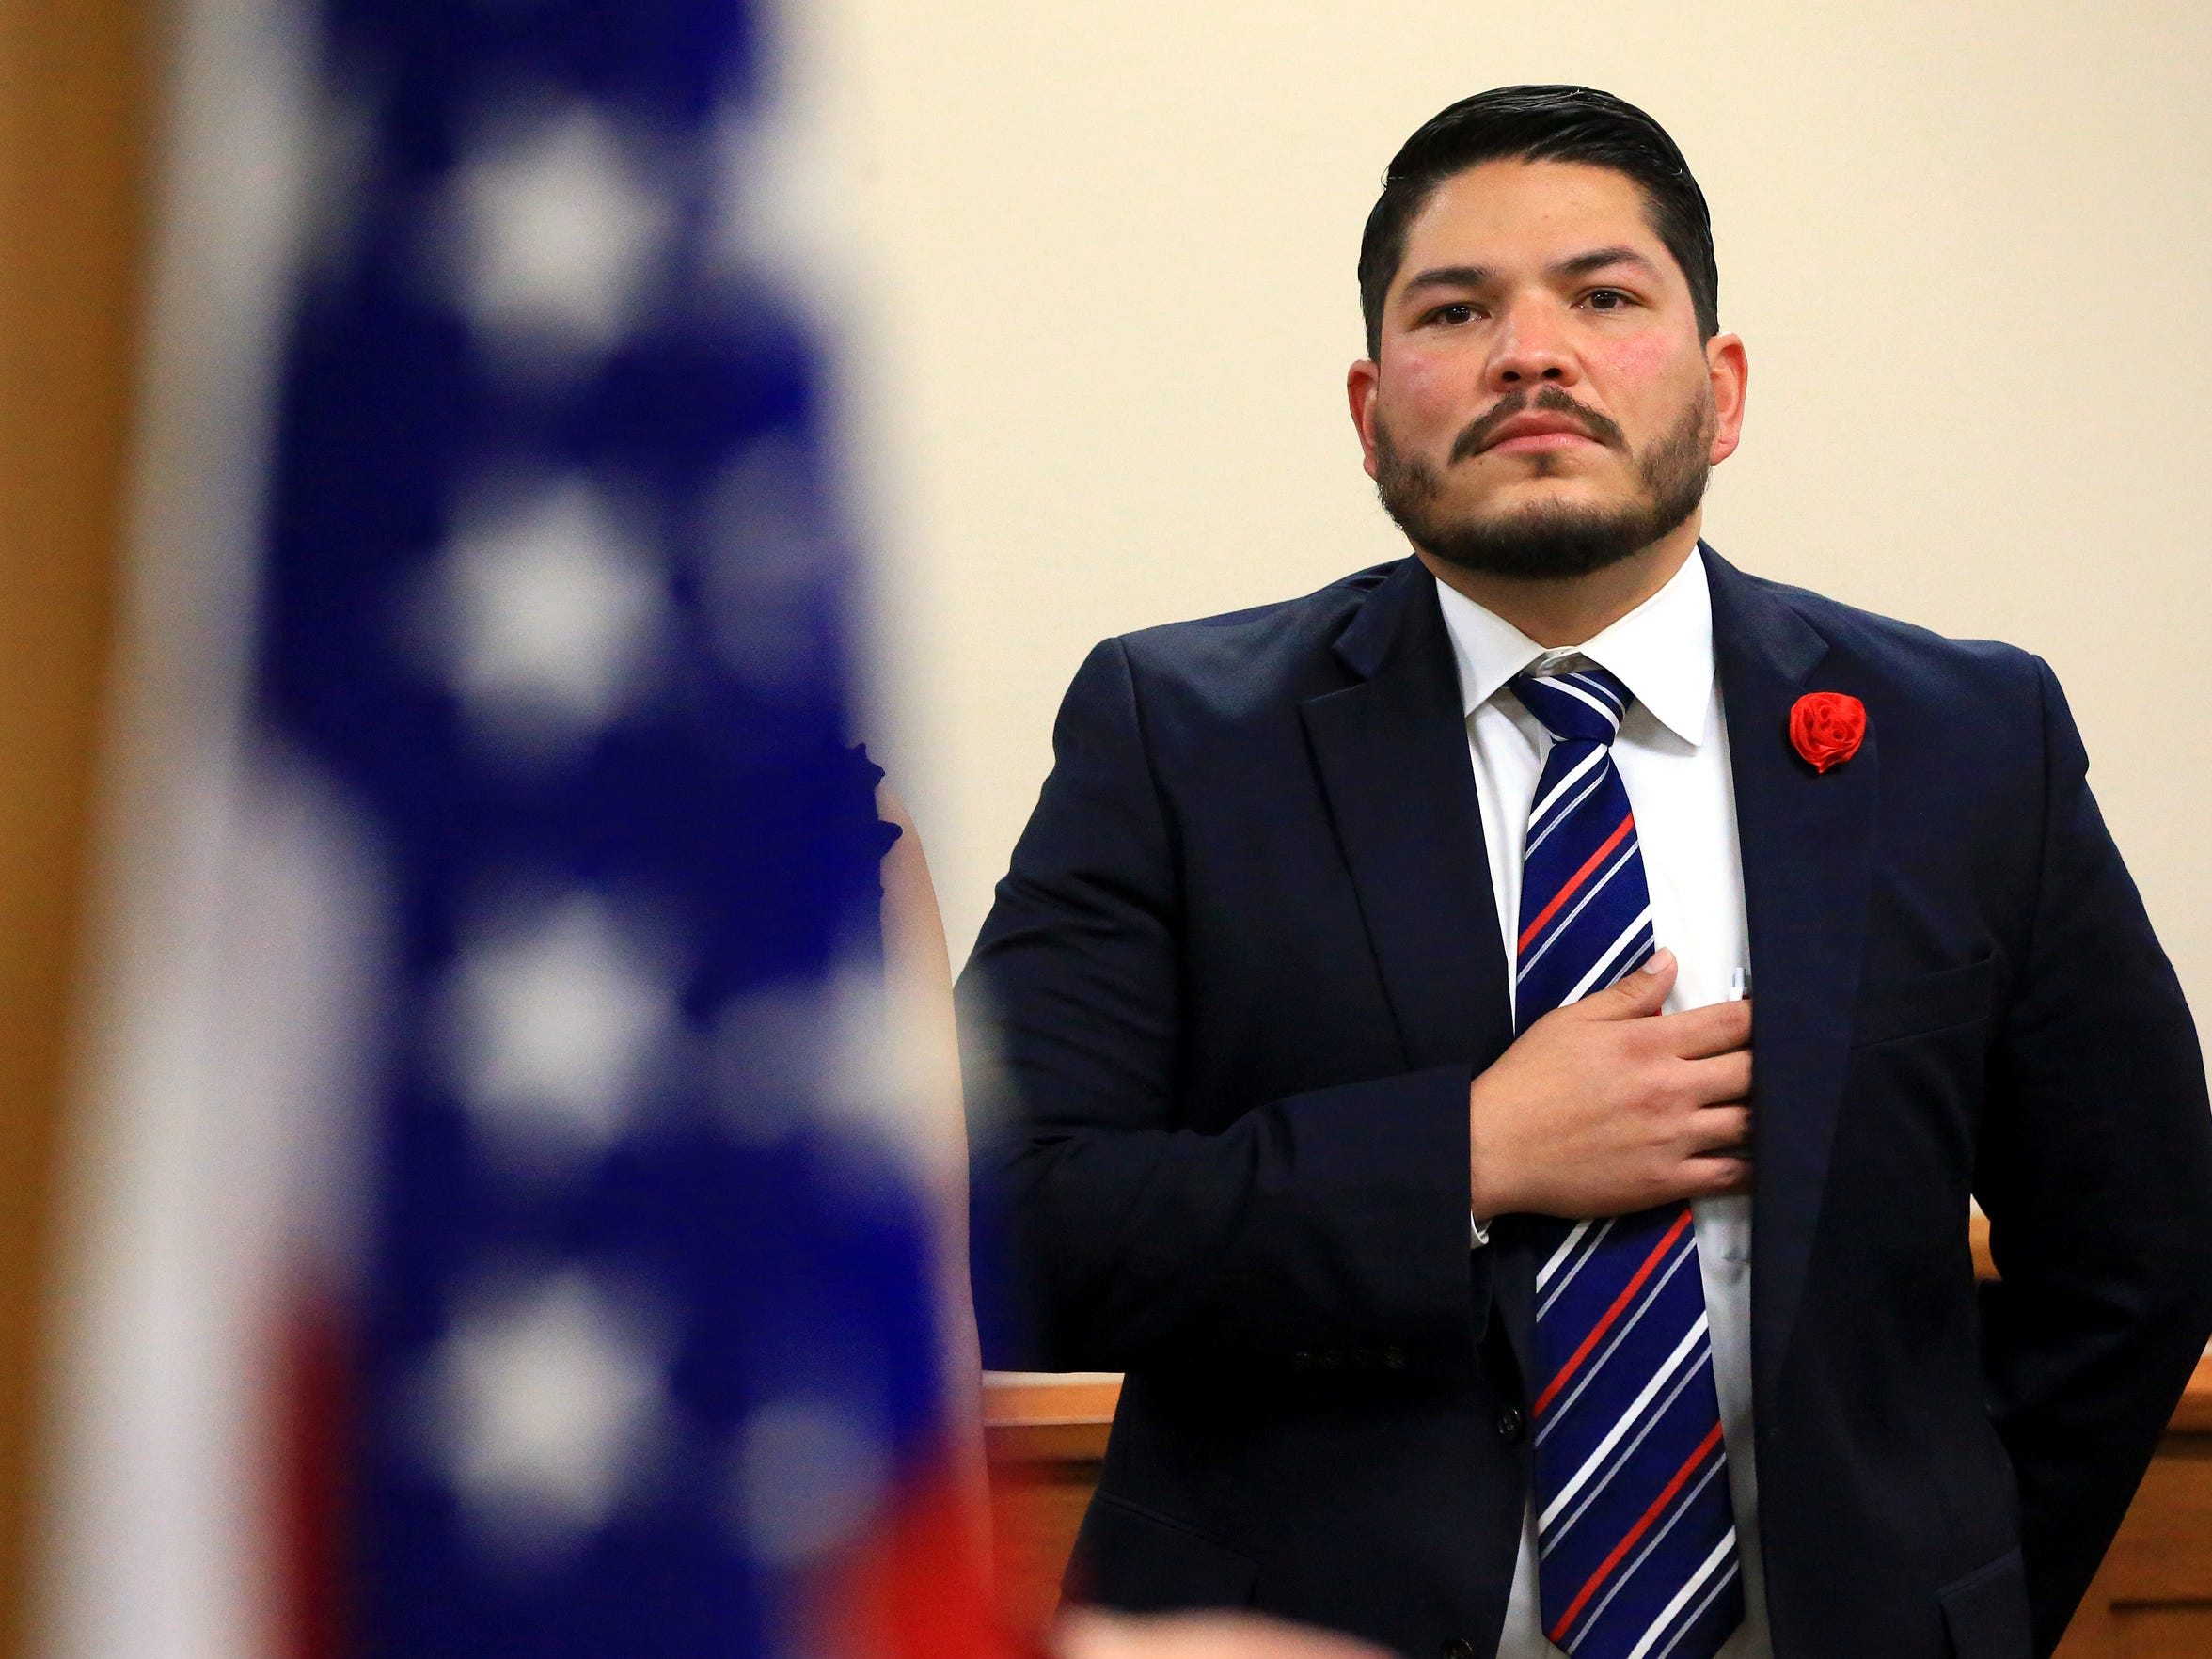 Nueces County District Attorney Mark Gonzalez stands